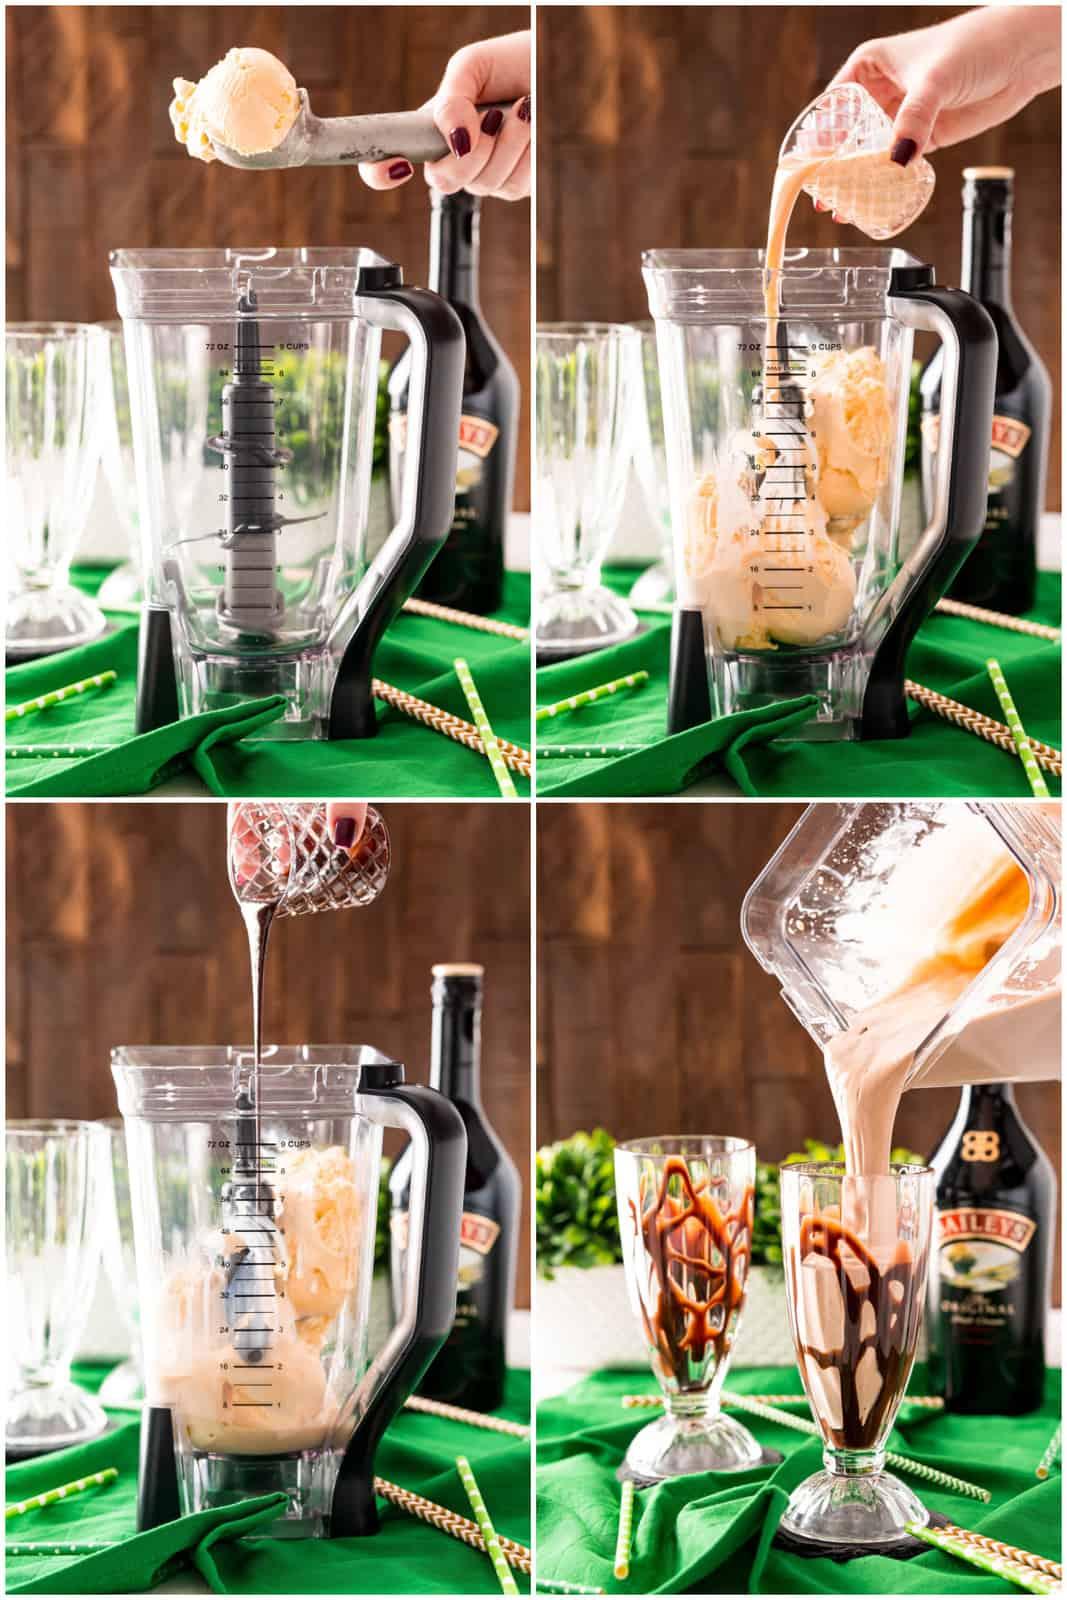 Step by step photos on how to make a Baileys Chocolate Milkshake